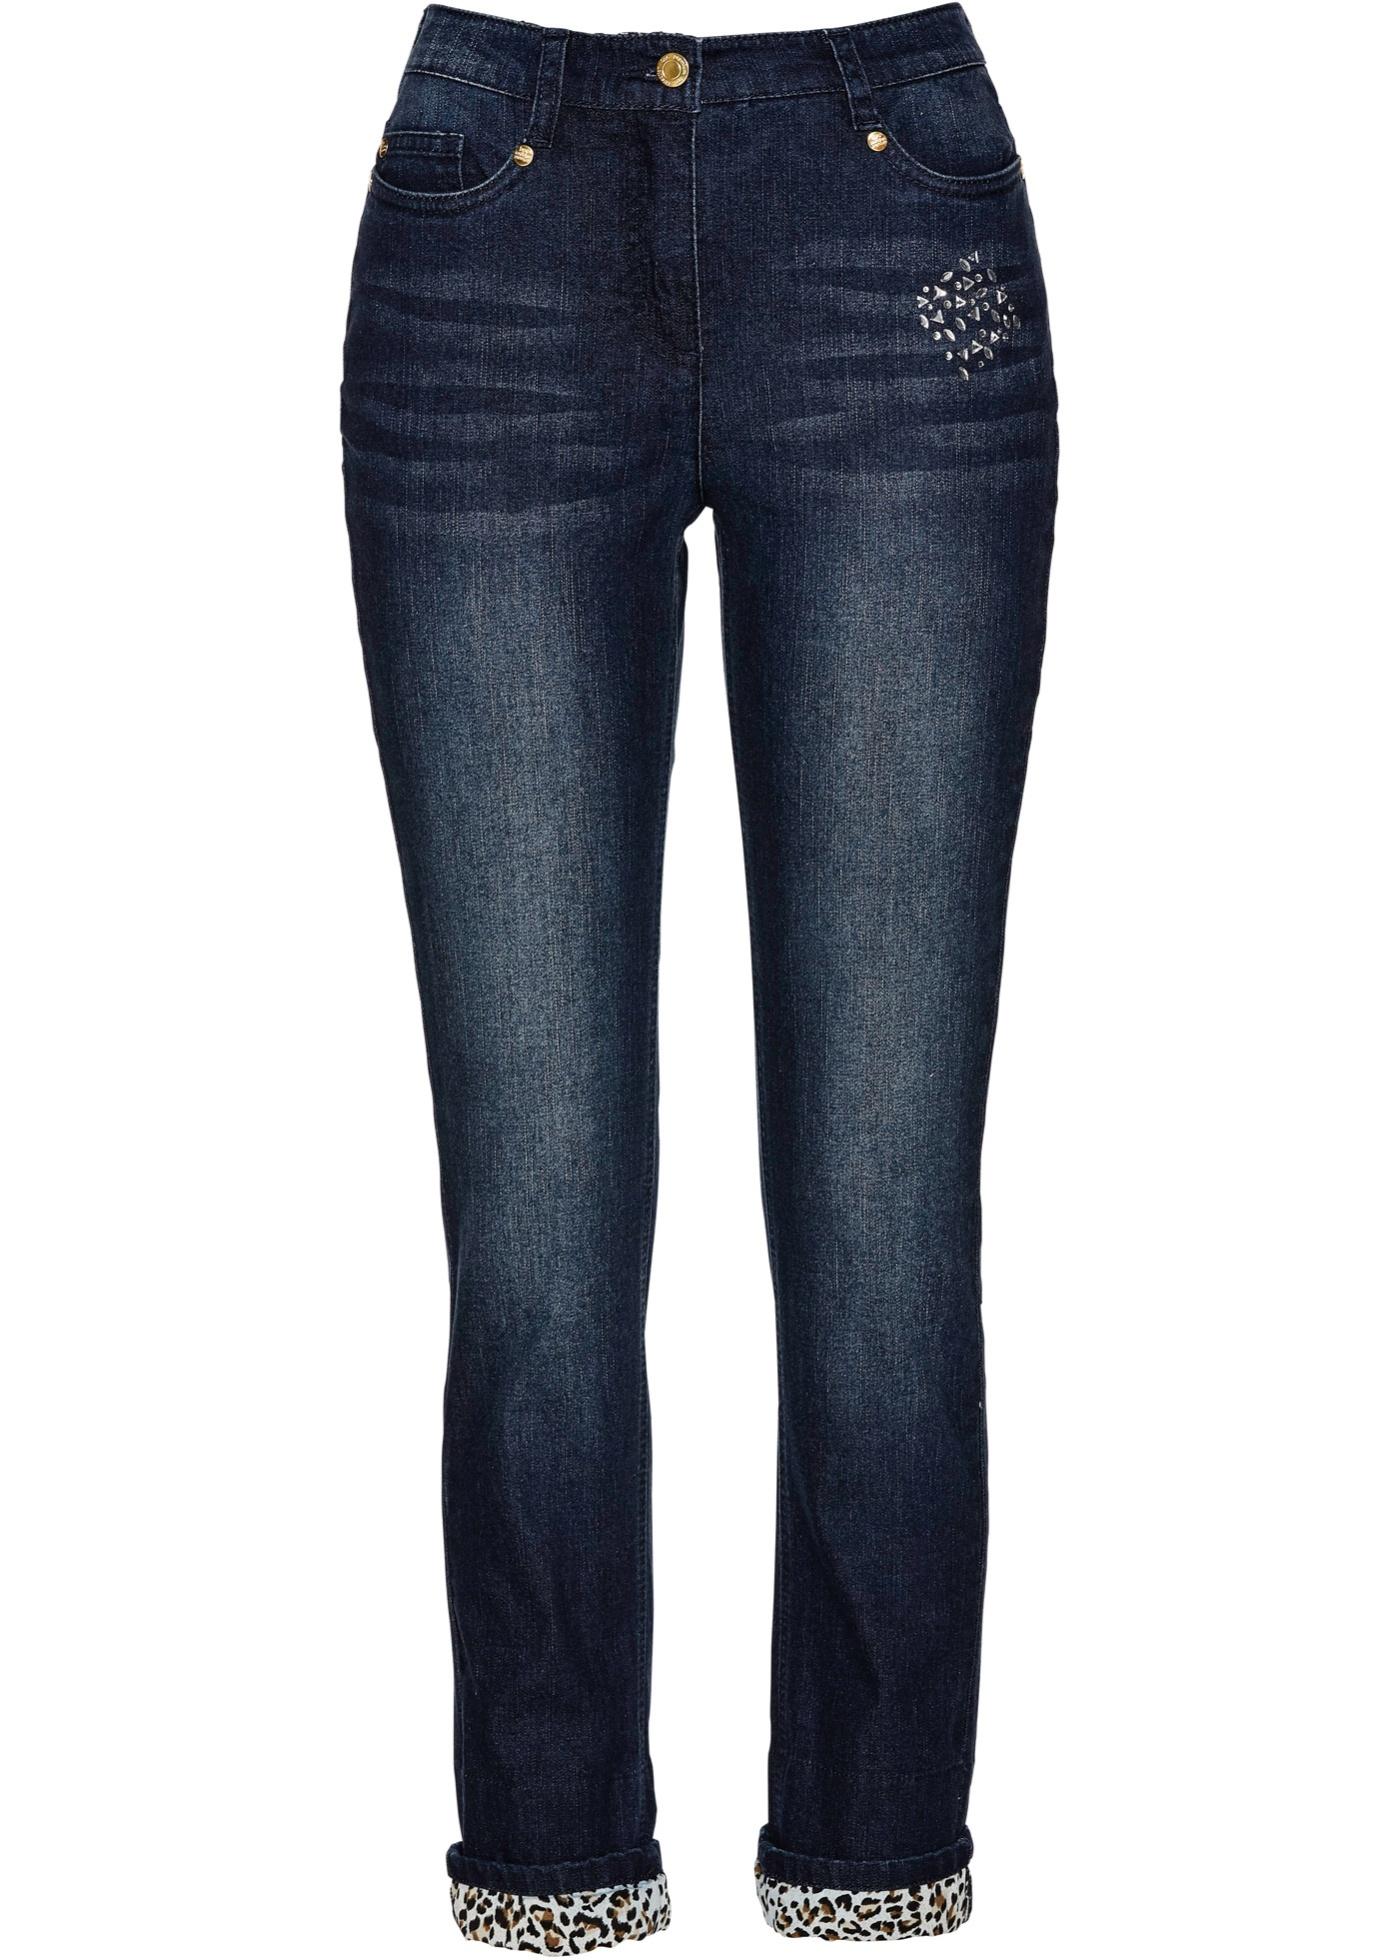 Premium Femme Avec Bleu Bpc Selection BonprixJean Pour Brillants Okn0wX8P